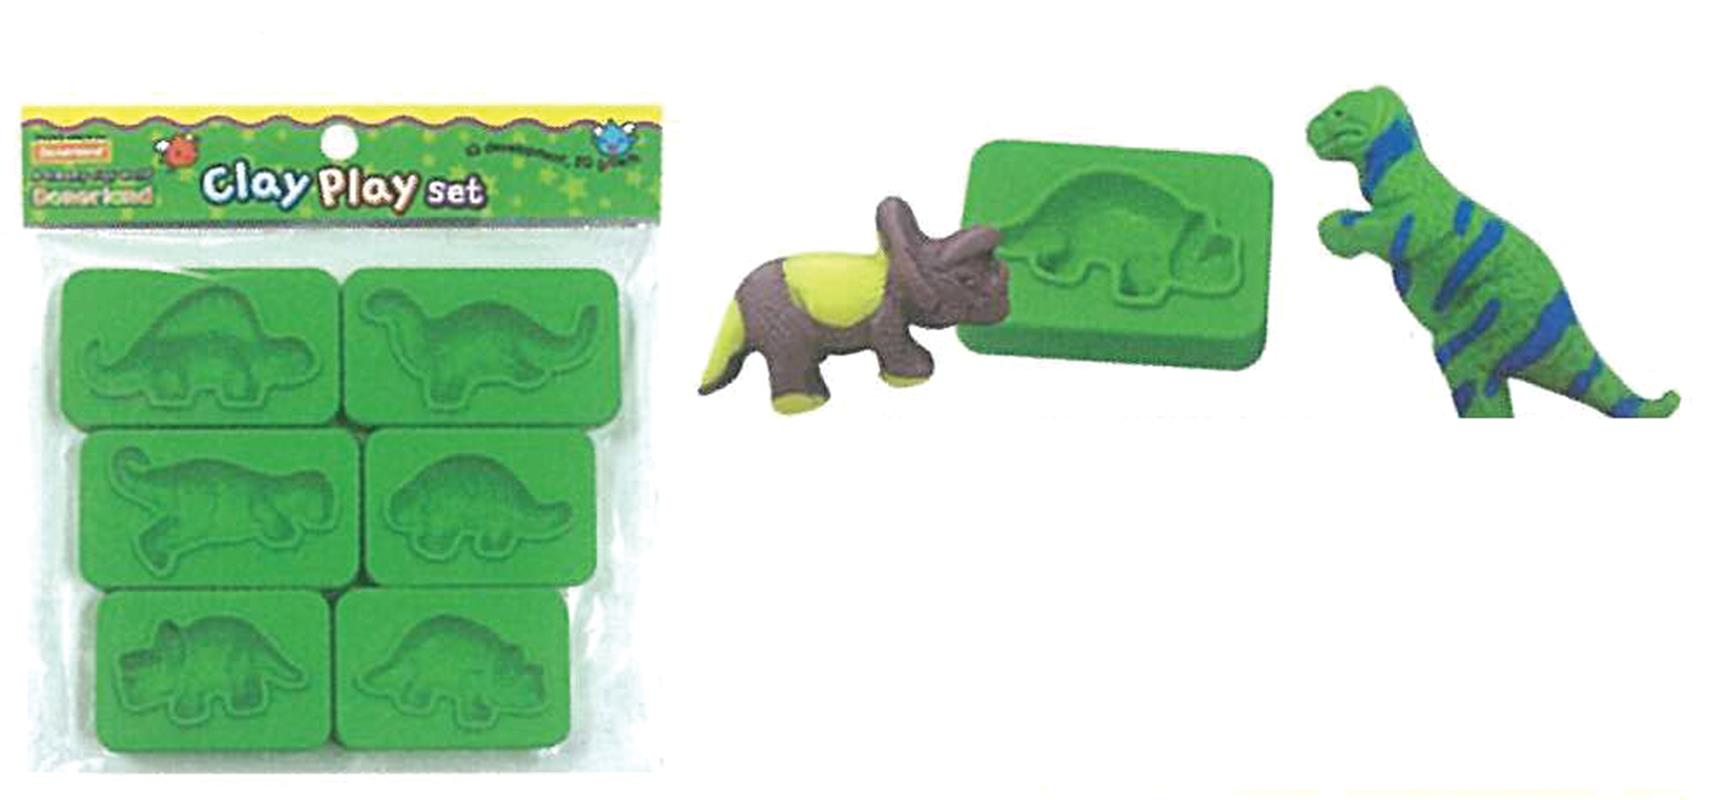 Donerland Καλούπια πλαστικά Δεινόσαυροι 6 σχέδια 28318---ΔΑ-2